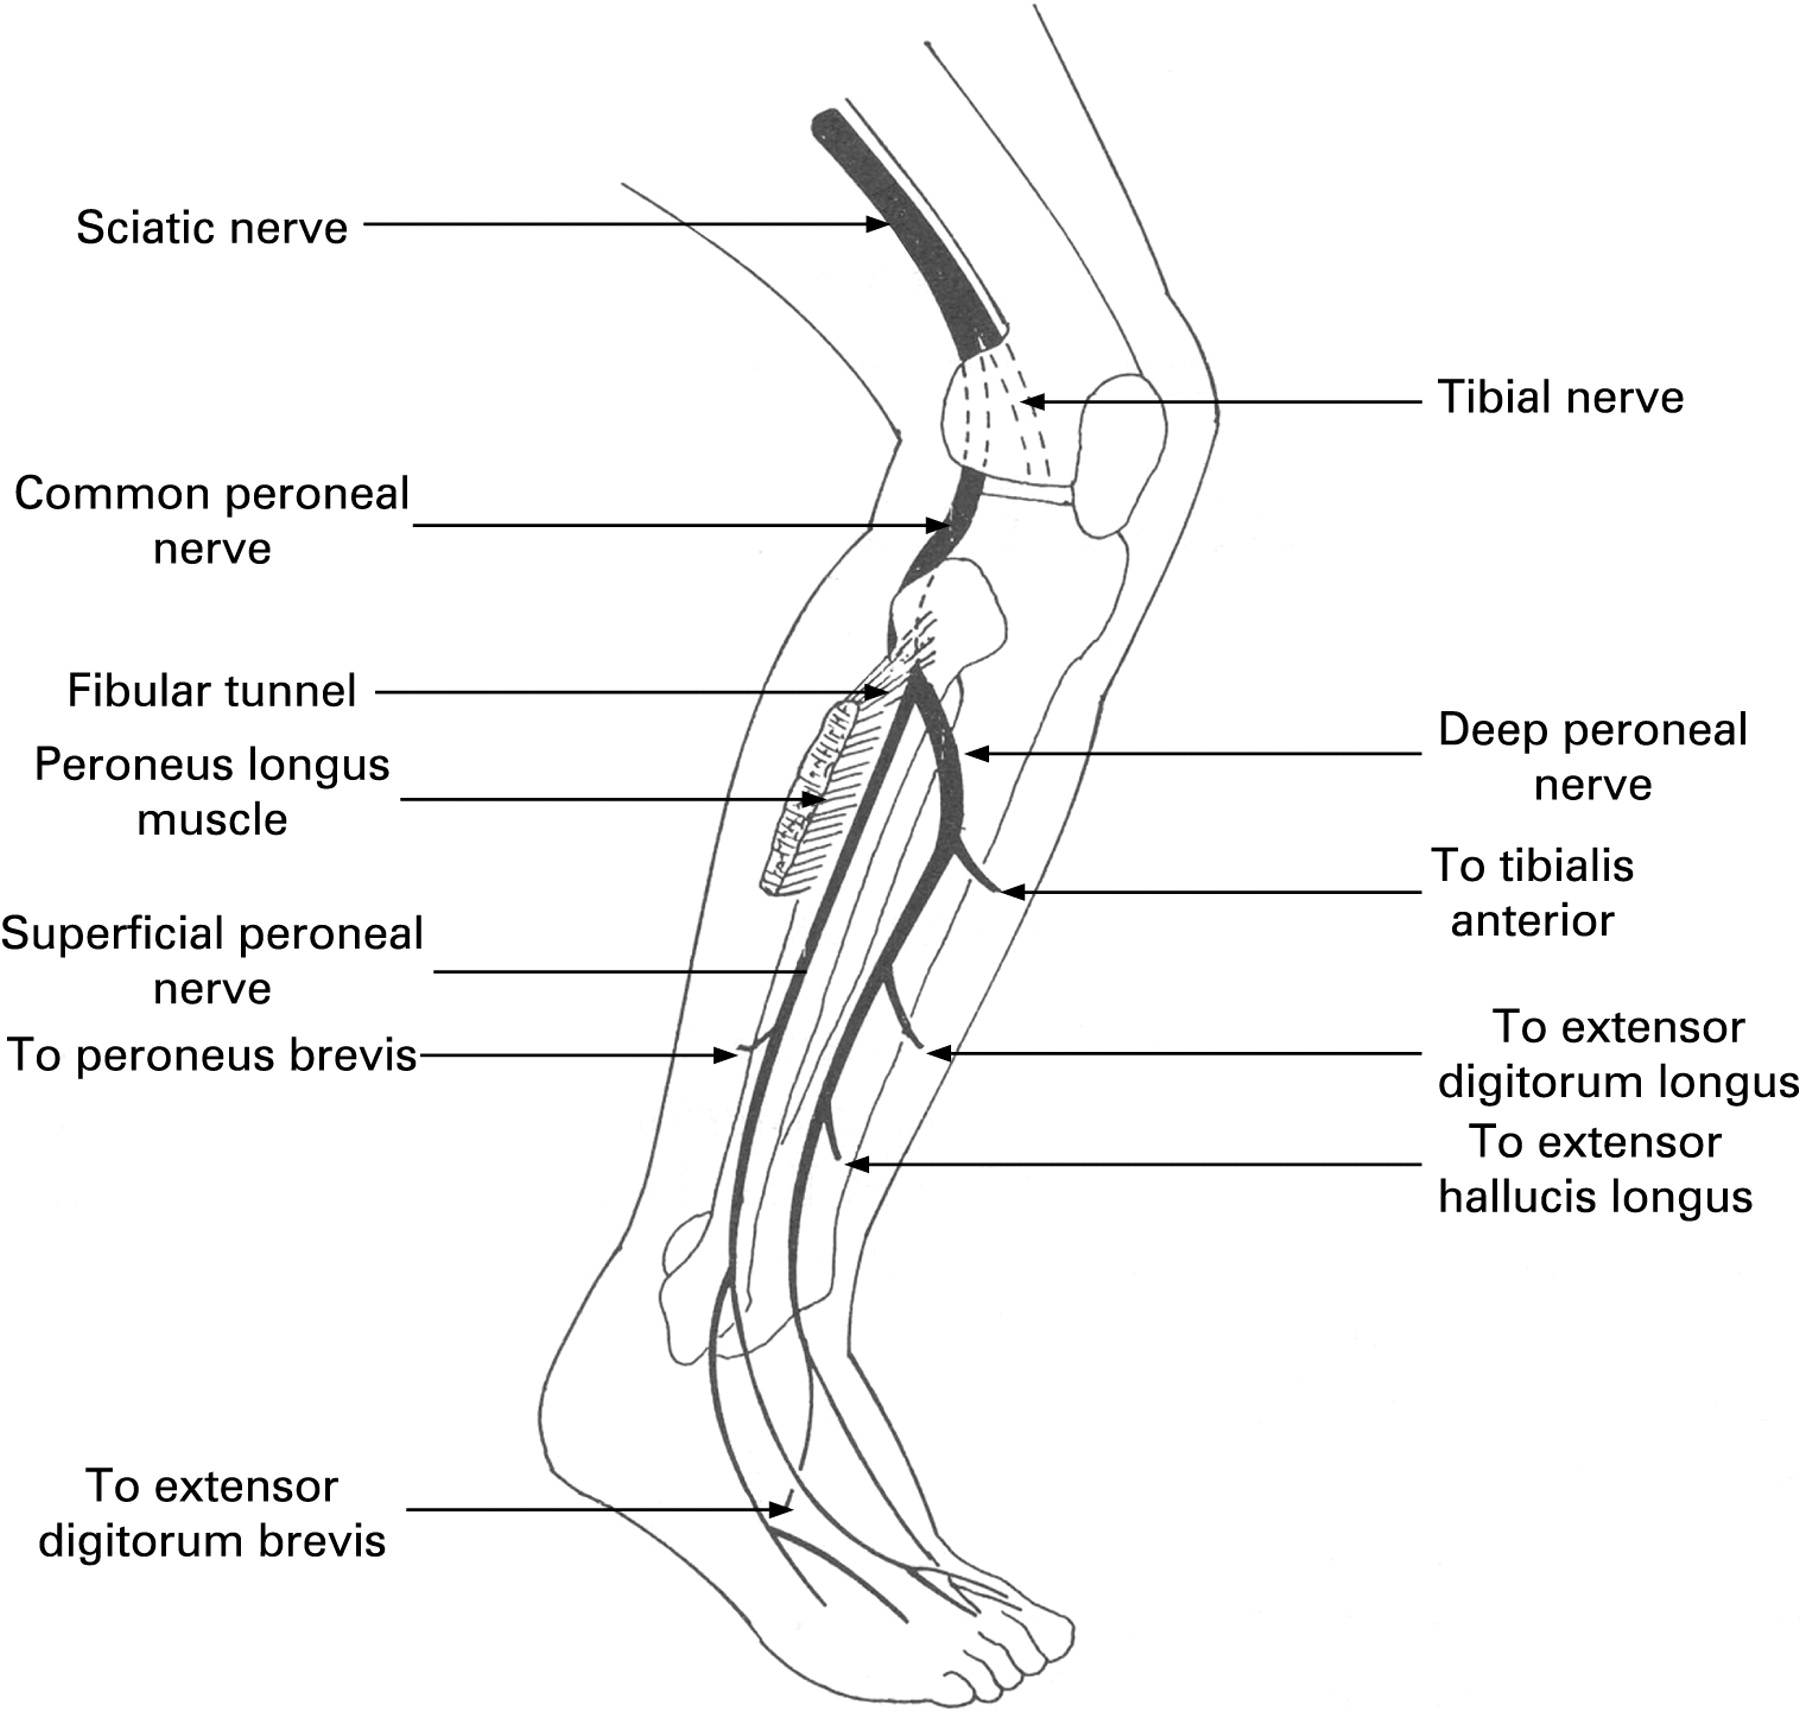 diagram of sciatic nerve pathway broan bathroom fans wiring 732 common peroneal stepwards